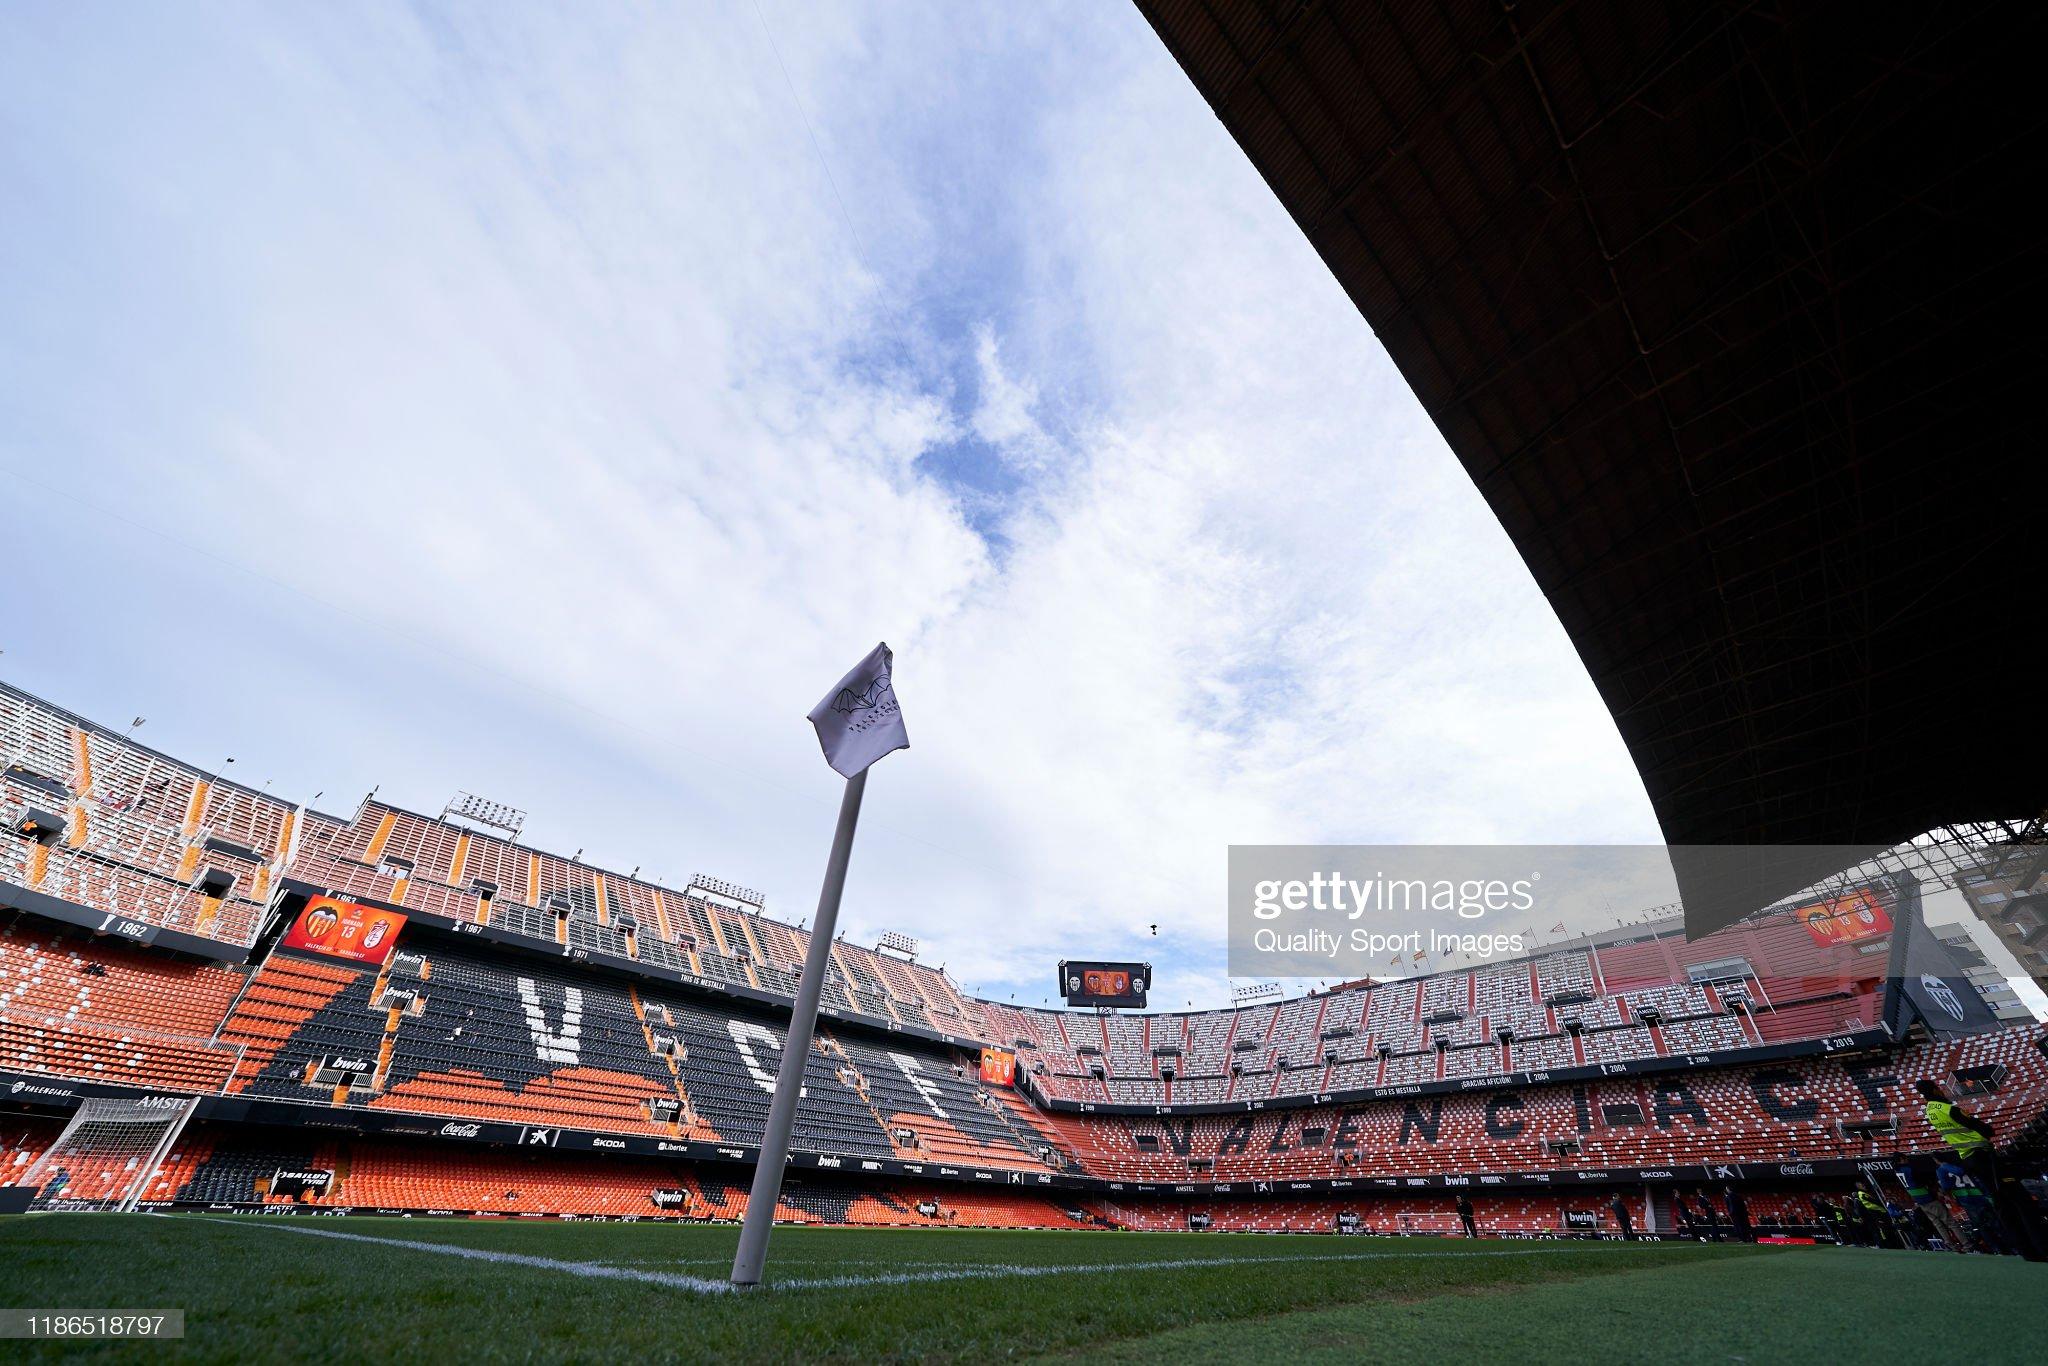 Valencia v Villarreal preview, prediction and odds